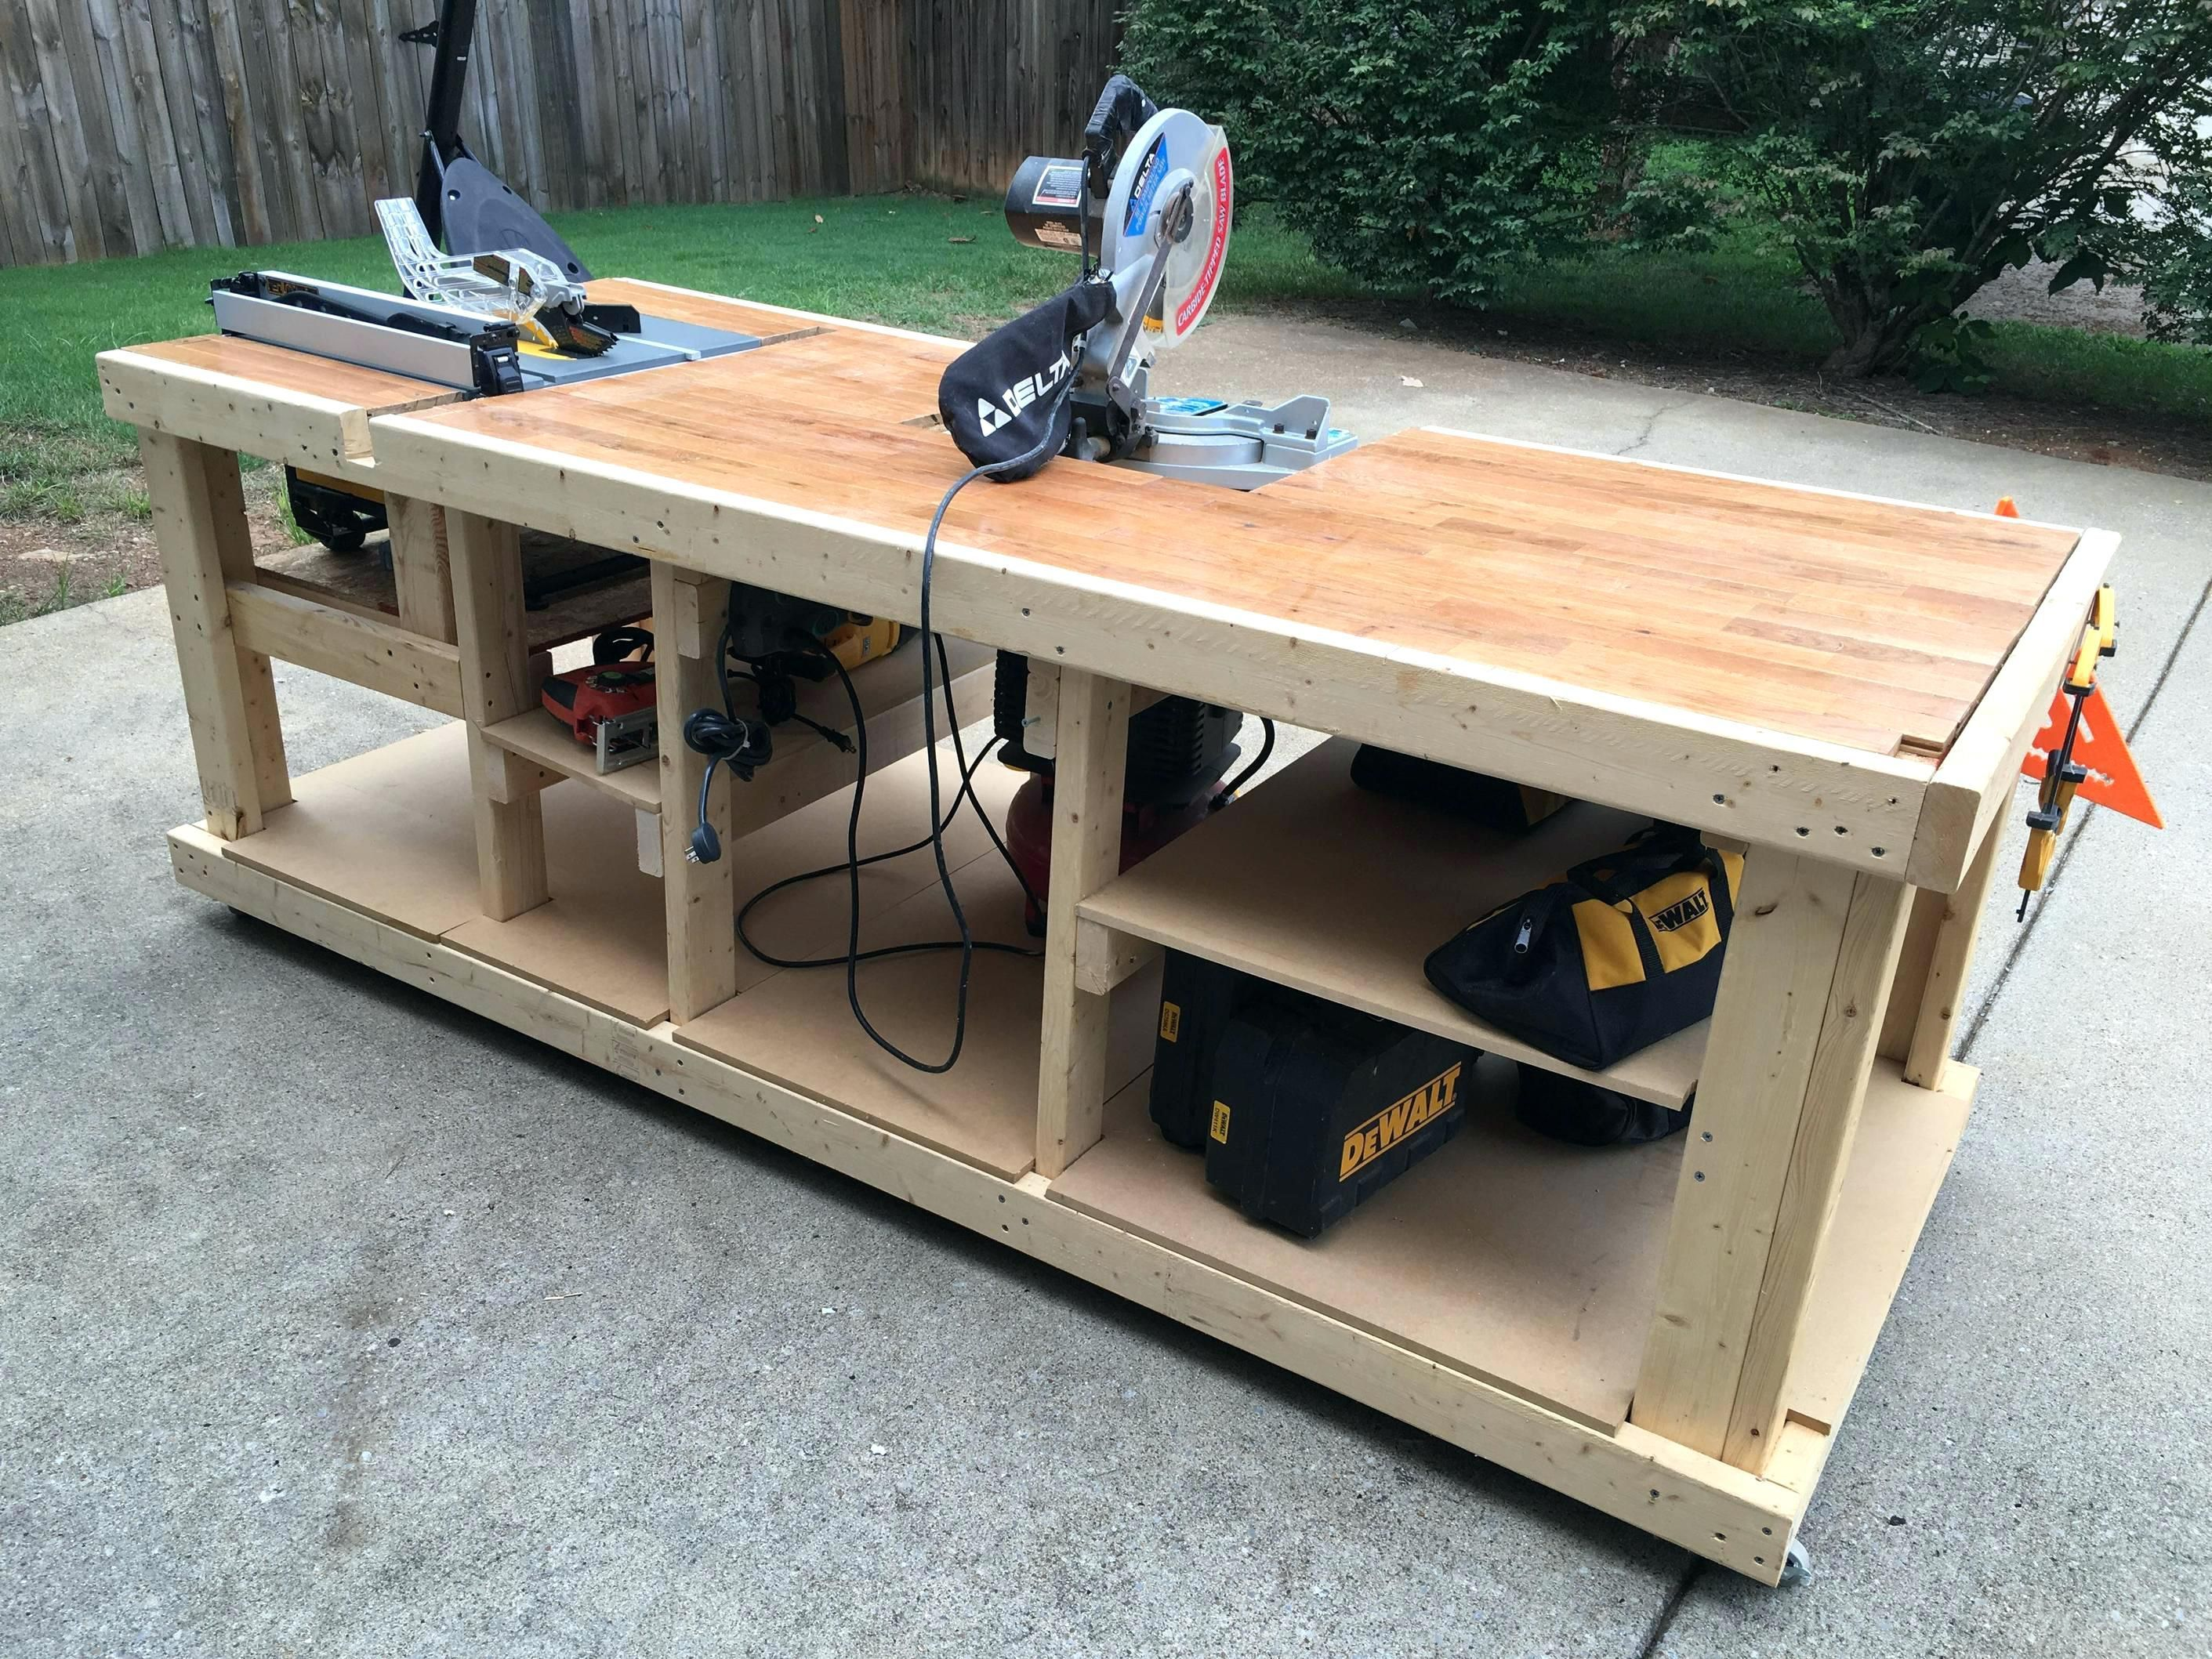 Modular Workbench Plans I Built A Mobile Workbenches Diy Woodworking Bench Plans Mobile Workbench Garage Work Bench